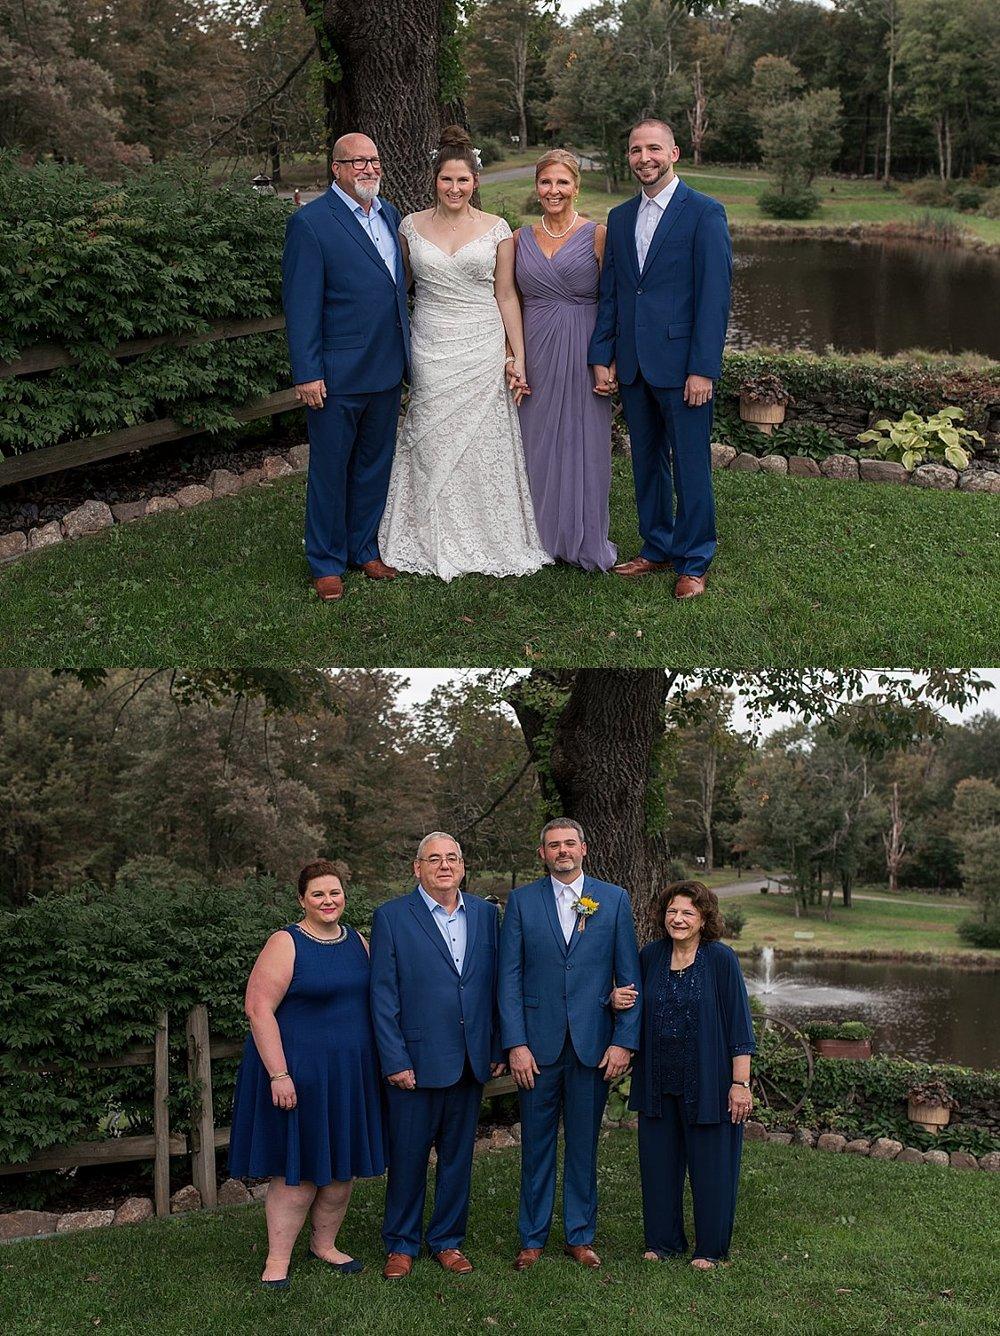 family portraits at connecticut wedding photos